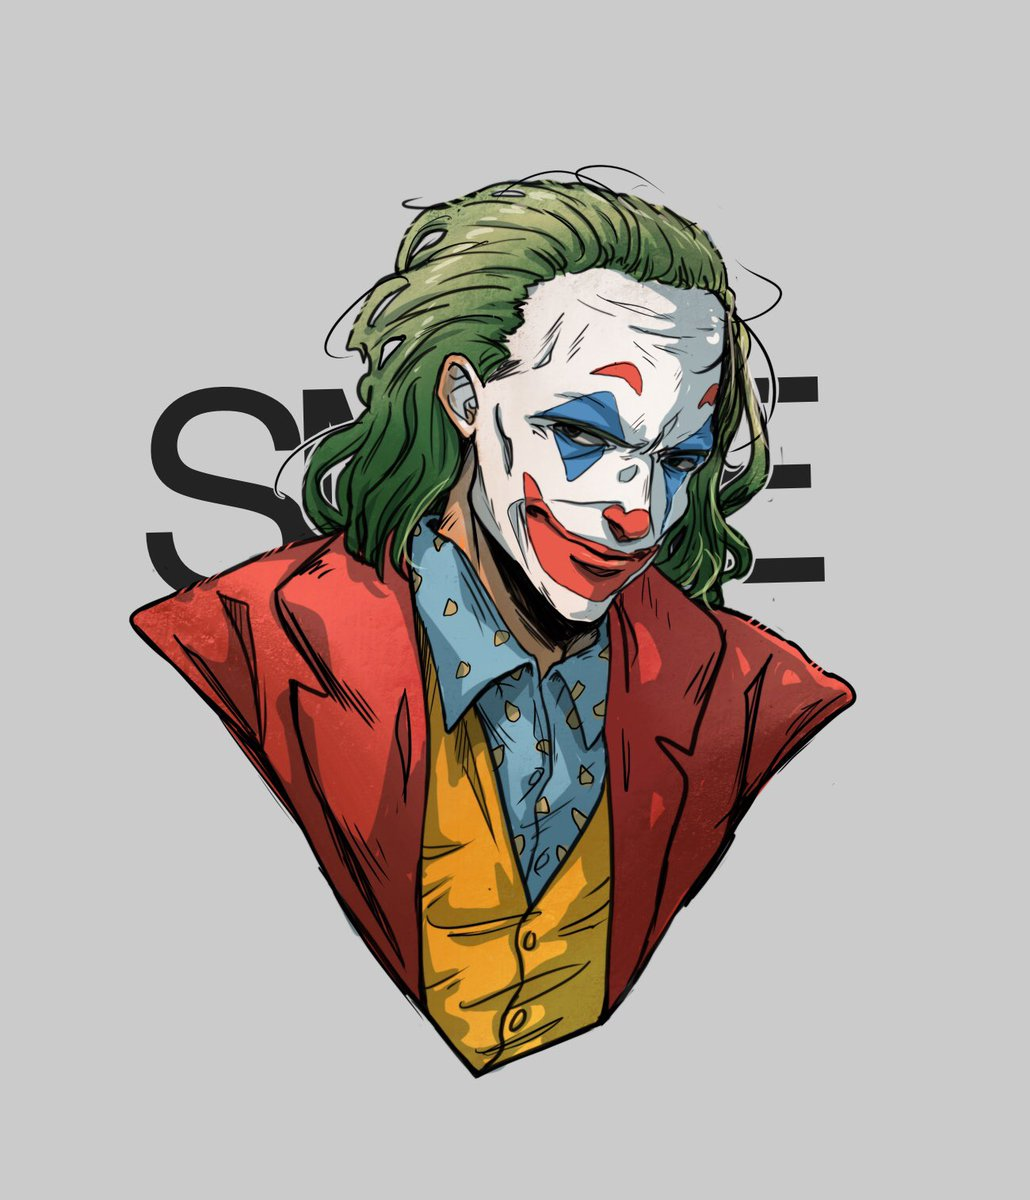 Batviolett On Twitter Smile Some Next Joker Fanart Hope You Enjoy Joaquinphoenix Joker Dc Fanart